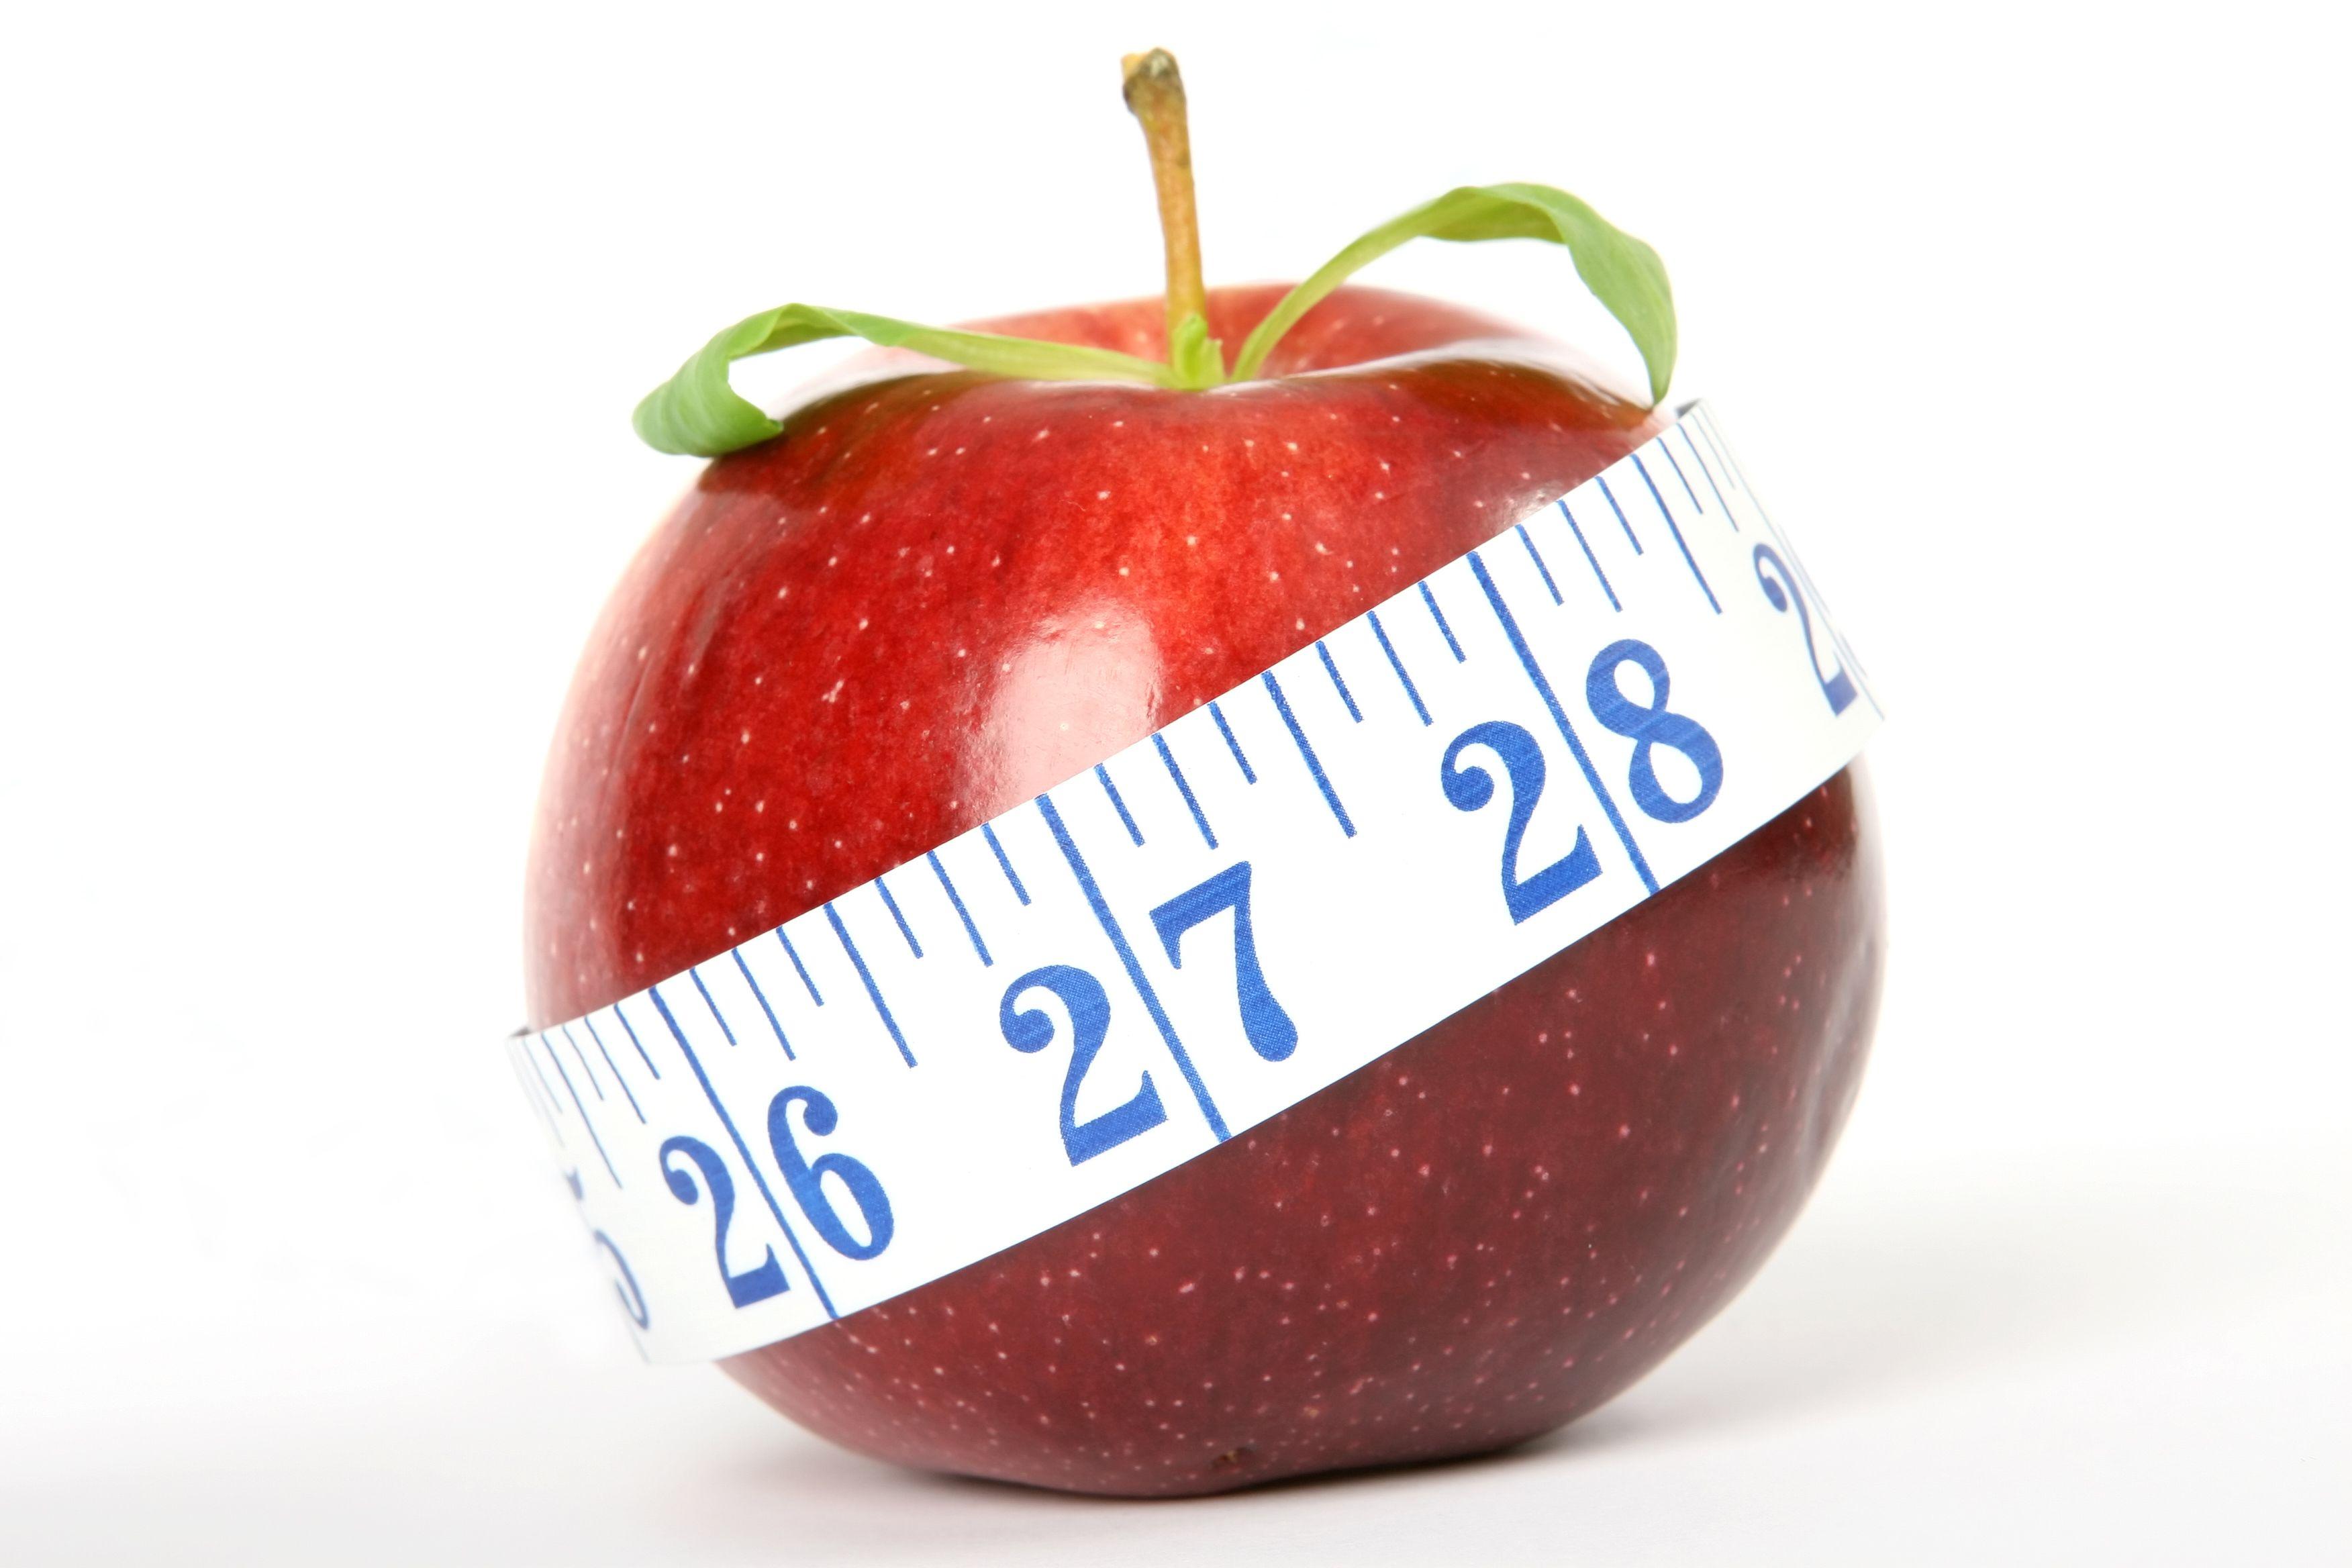 3 days no food weight loss